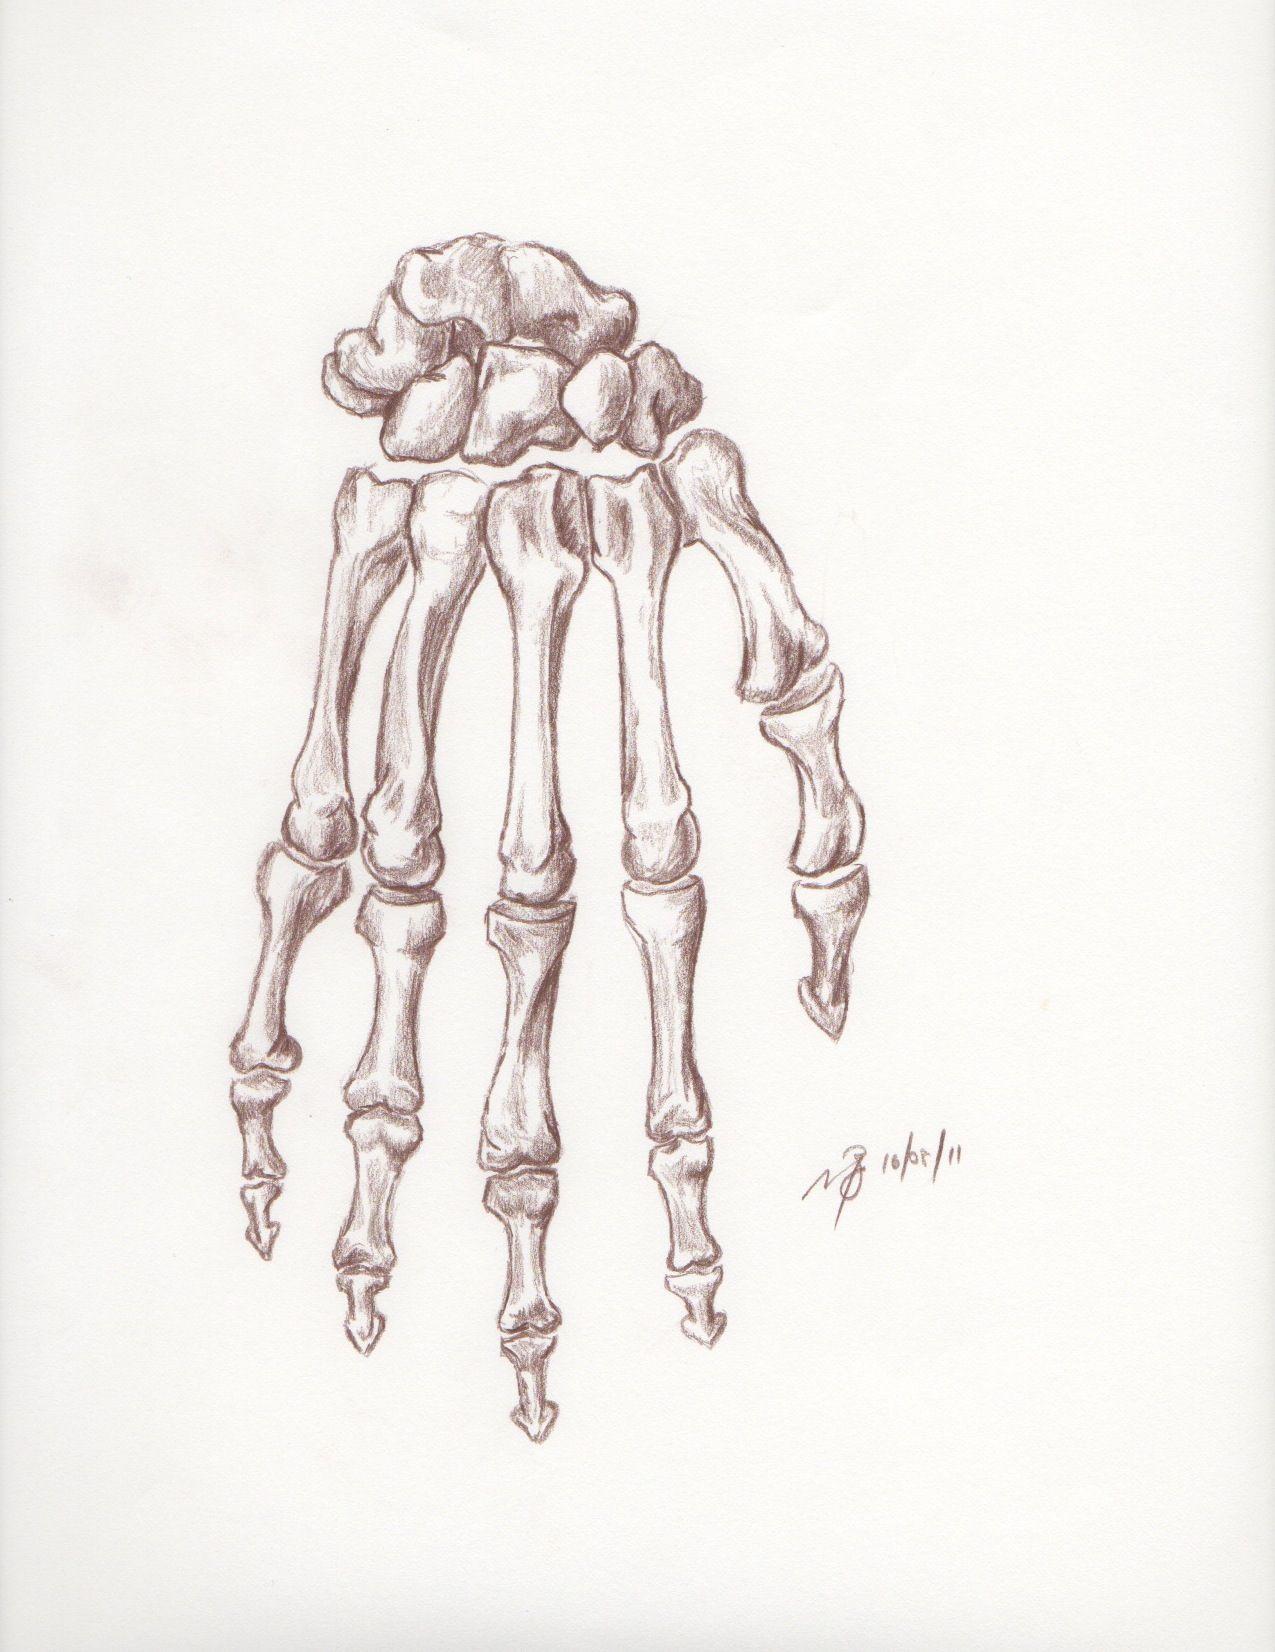 картинка скелет кисти руки зараженная